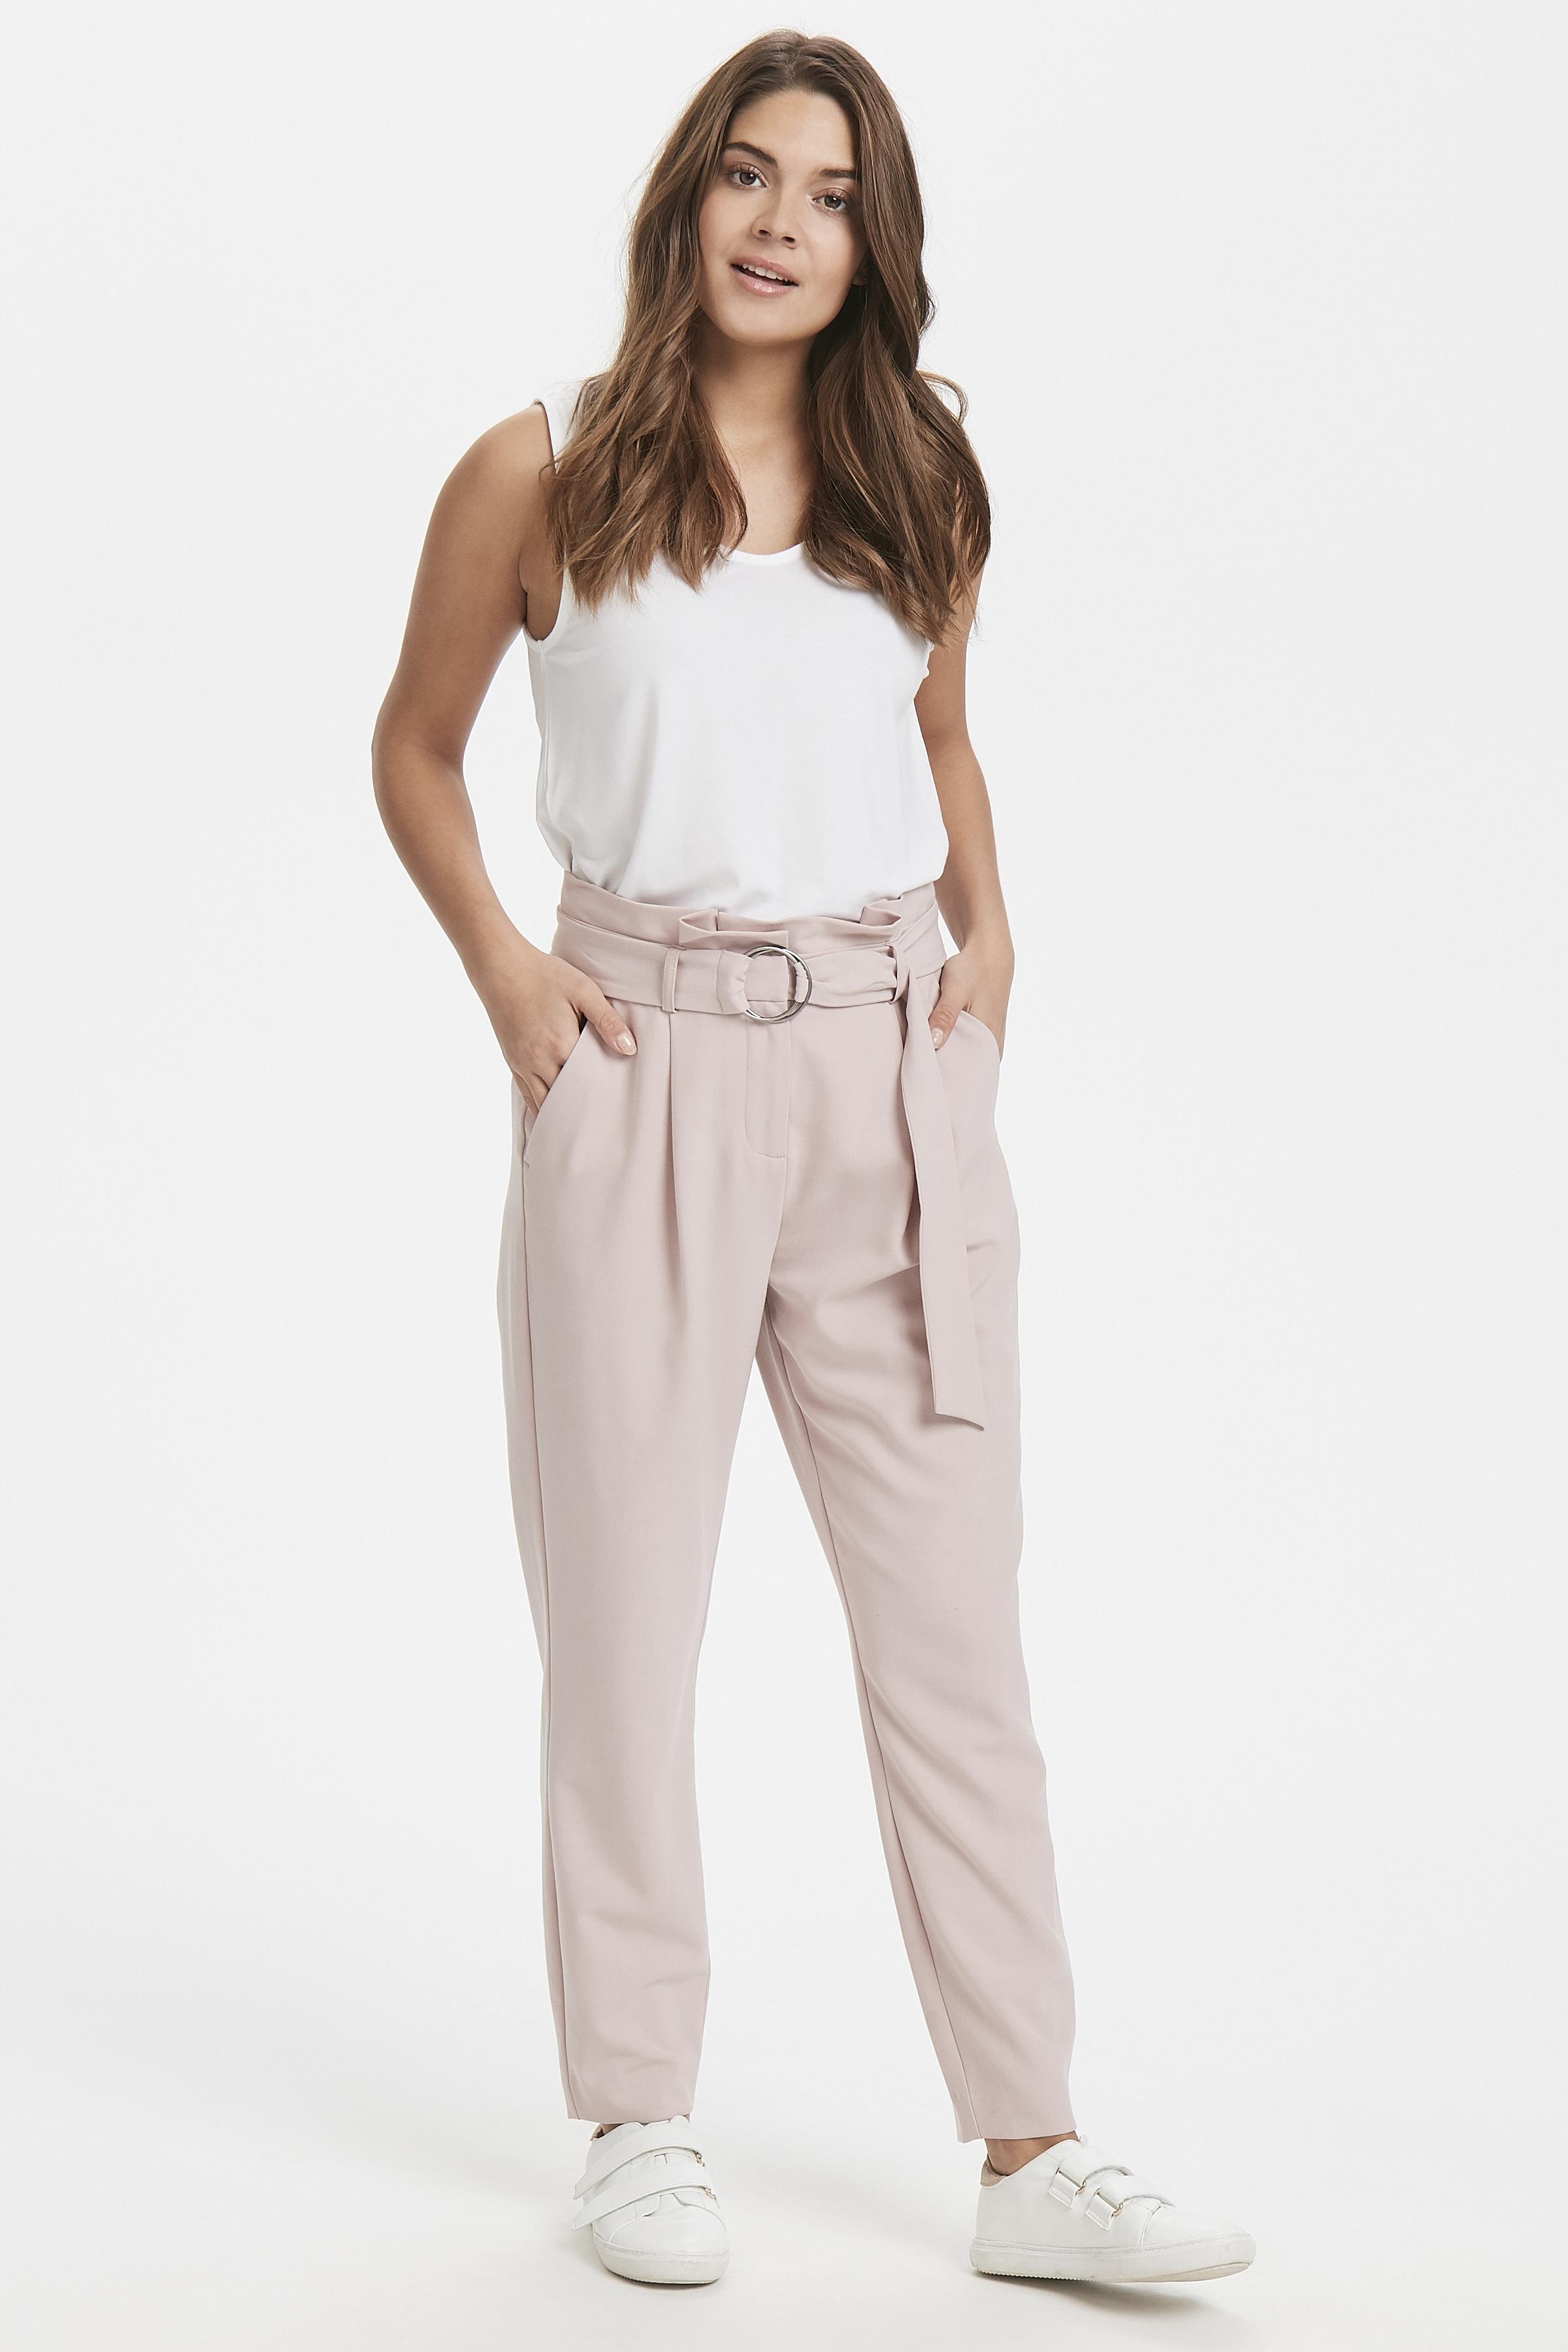 Rose Cloud Pants Suiting fra b.young – Køb Rose Cloud Pants Suiting fra str. 34-46 her